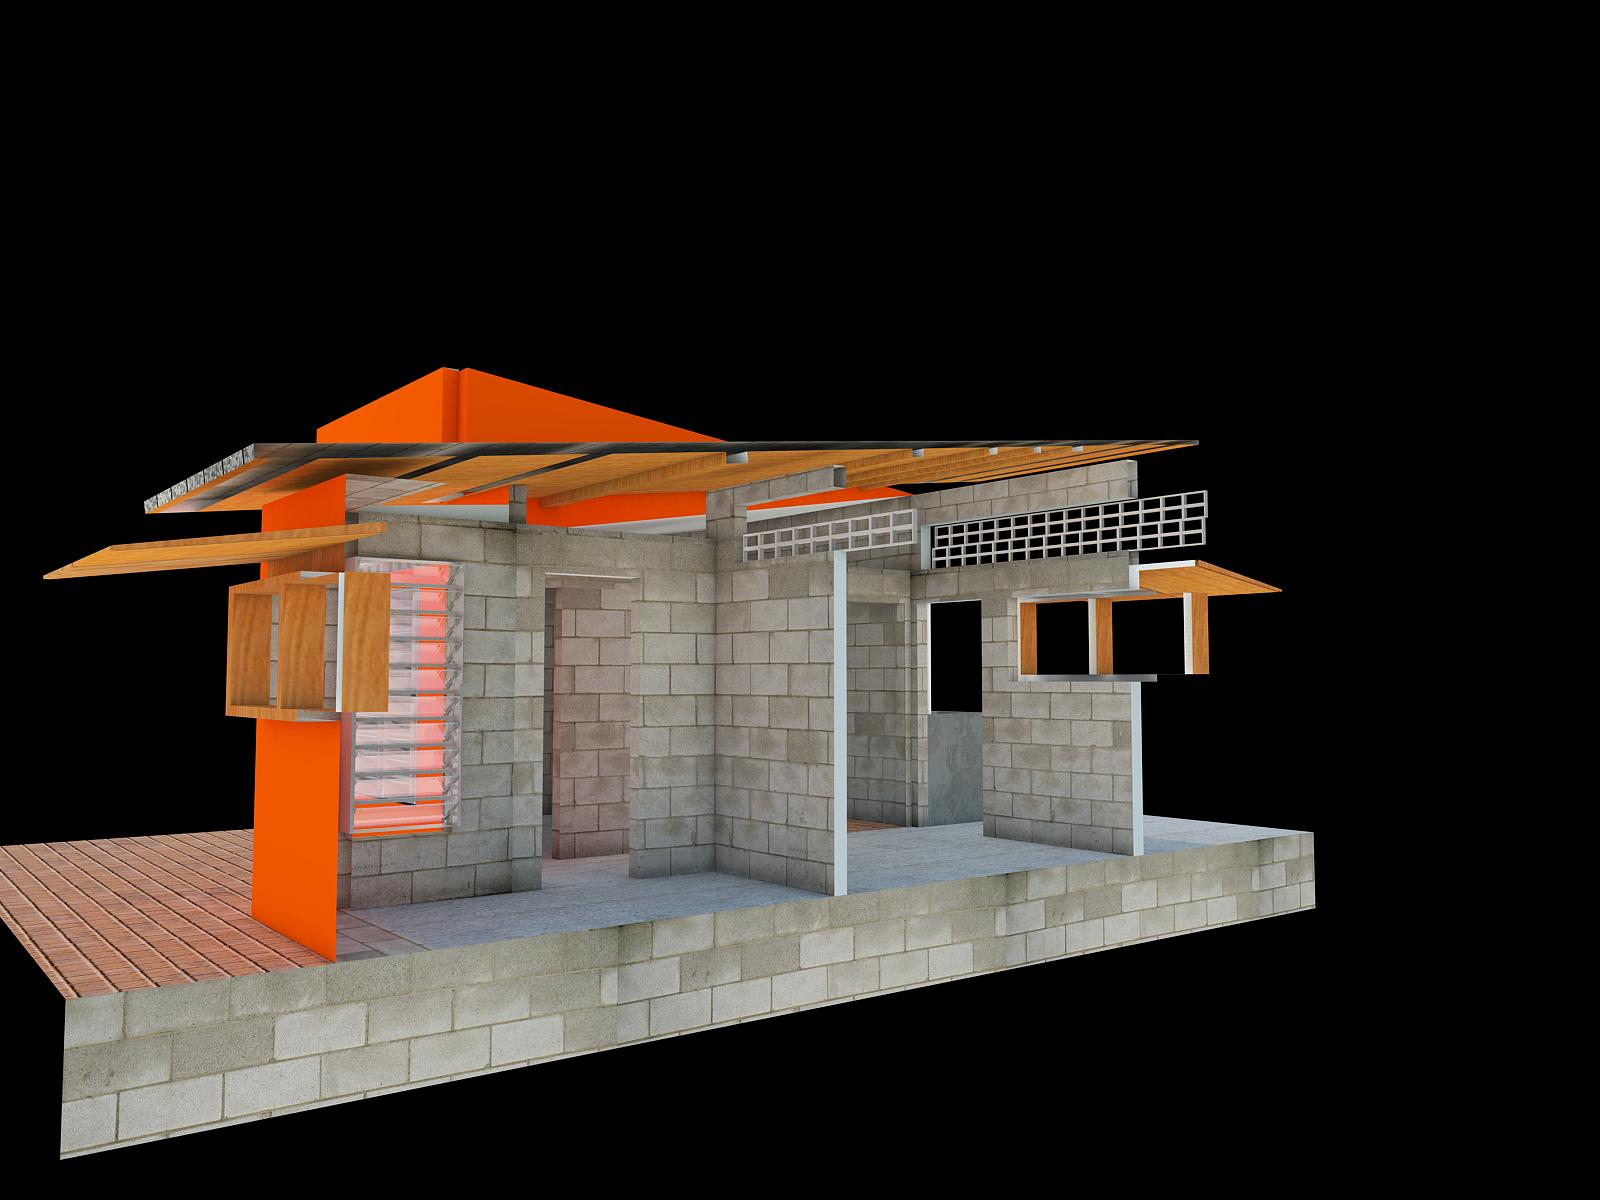 Proyecto de vivienda social en galapa atl ntico dise o for Diseno de viviendas